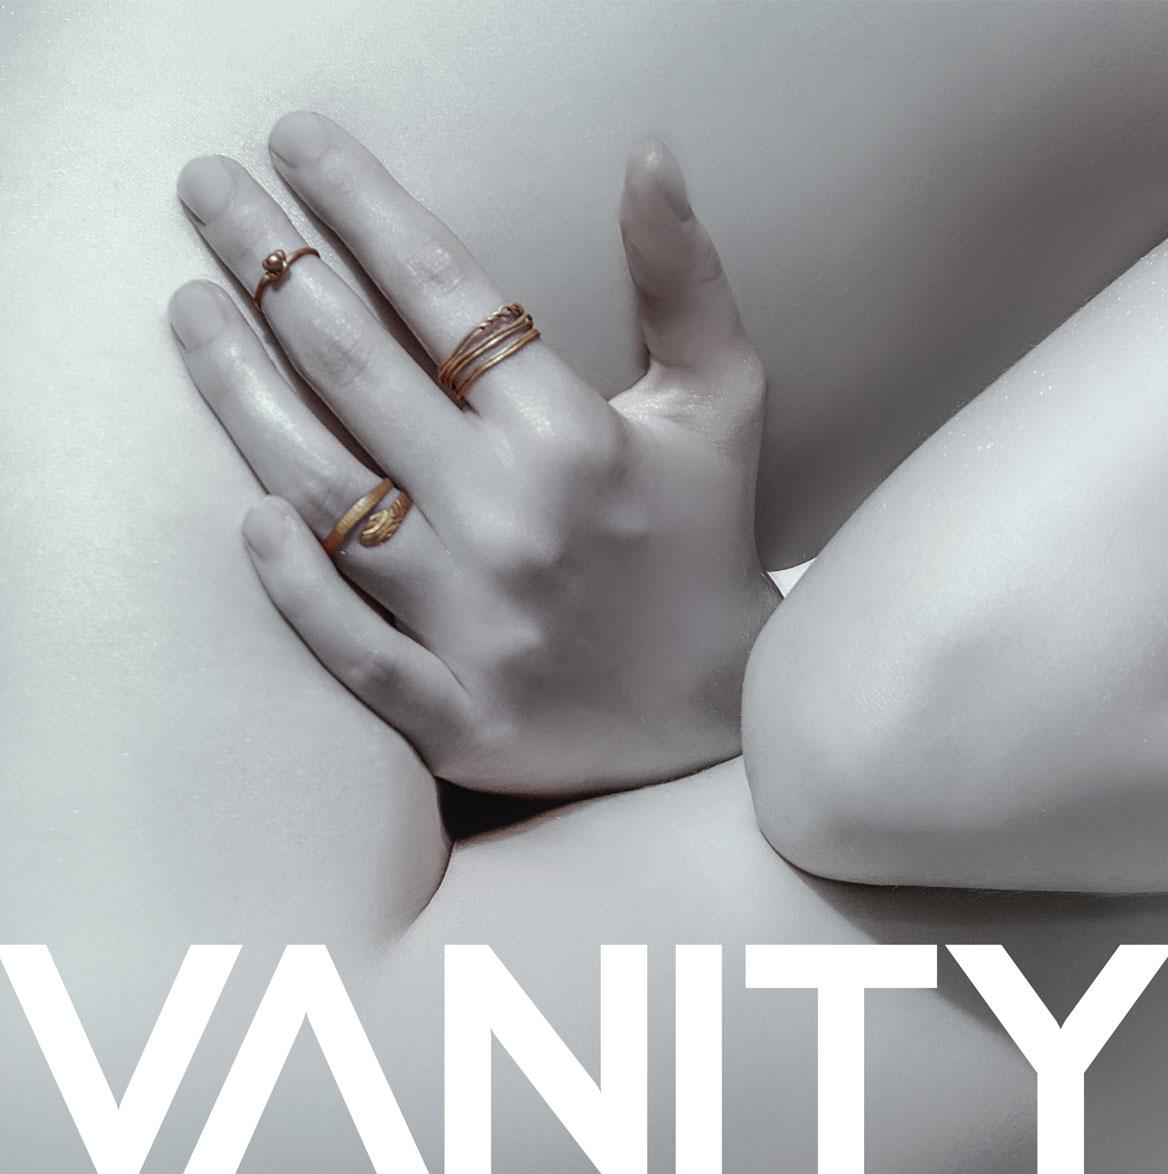 «Vanity. Ιστορίες Κοσμημάτων από τις Κυκλάδες» είναι ο τίτλος της έκθεσης που θα παρουσιαστεί στο Αρχαιολογικό Μουσείο Μυκόνου.